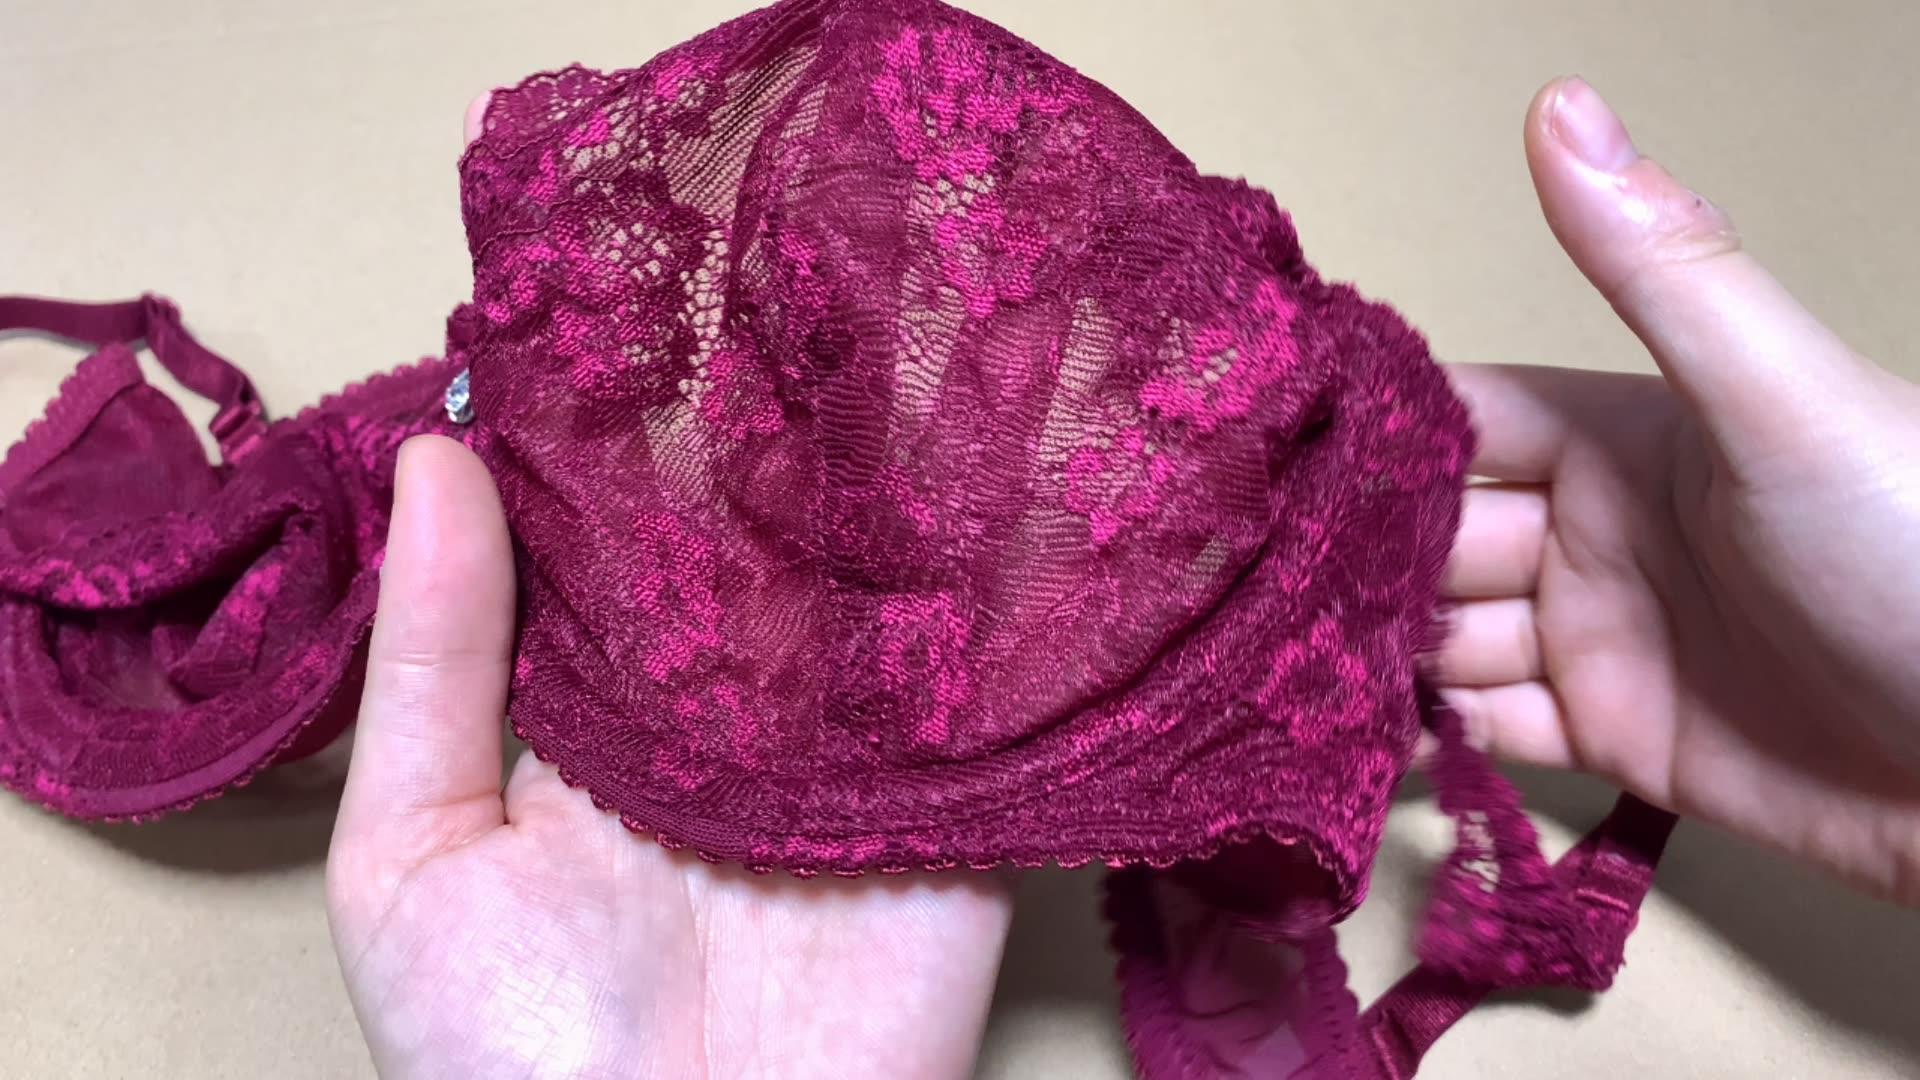 Design Bra Set Ladies Sexy Net Bra Sets New Bra Panty